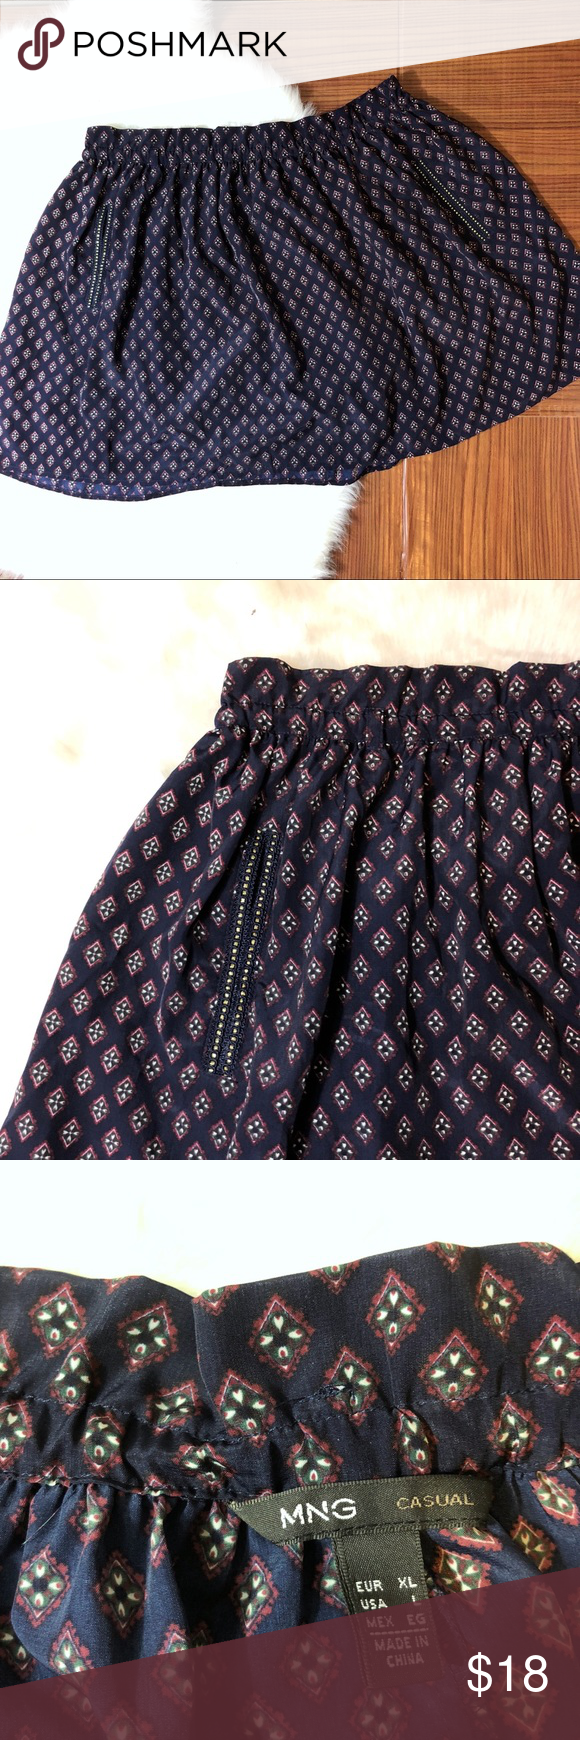 900a2bc1b MANGO Navy Geo Flowy Mini Skirt Lightweight flowy mini skirt by MNG (Mango).  2 side front slid pockets lined with embellishment. Waist (across) 17